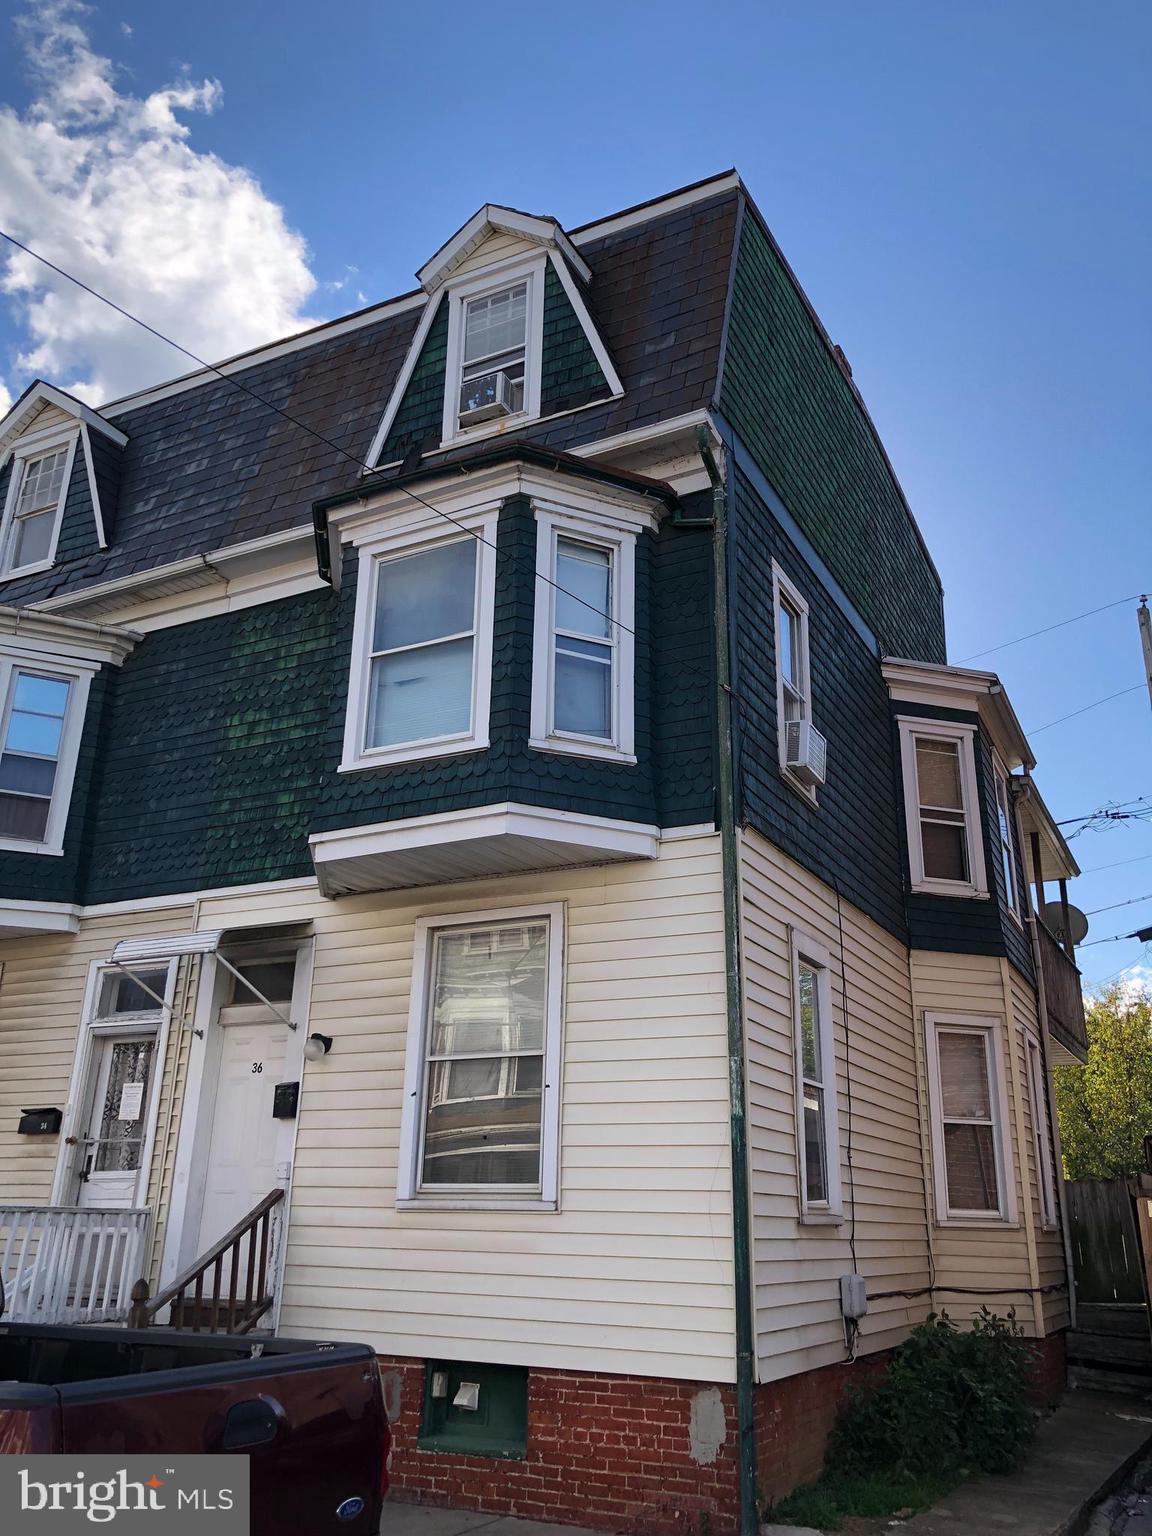 36 N West, York, PA 17401